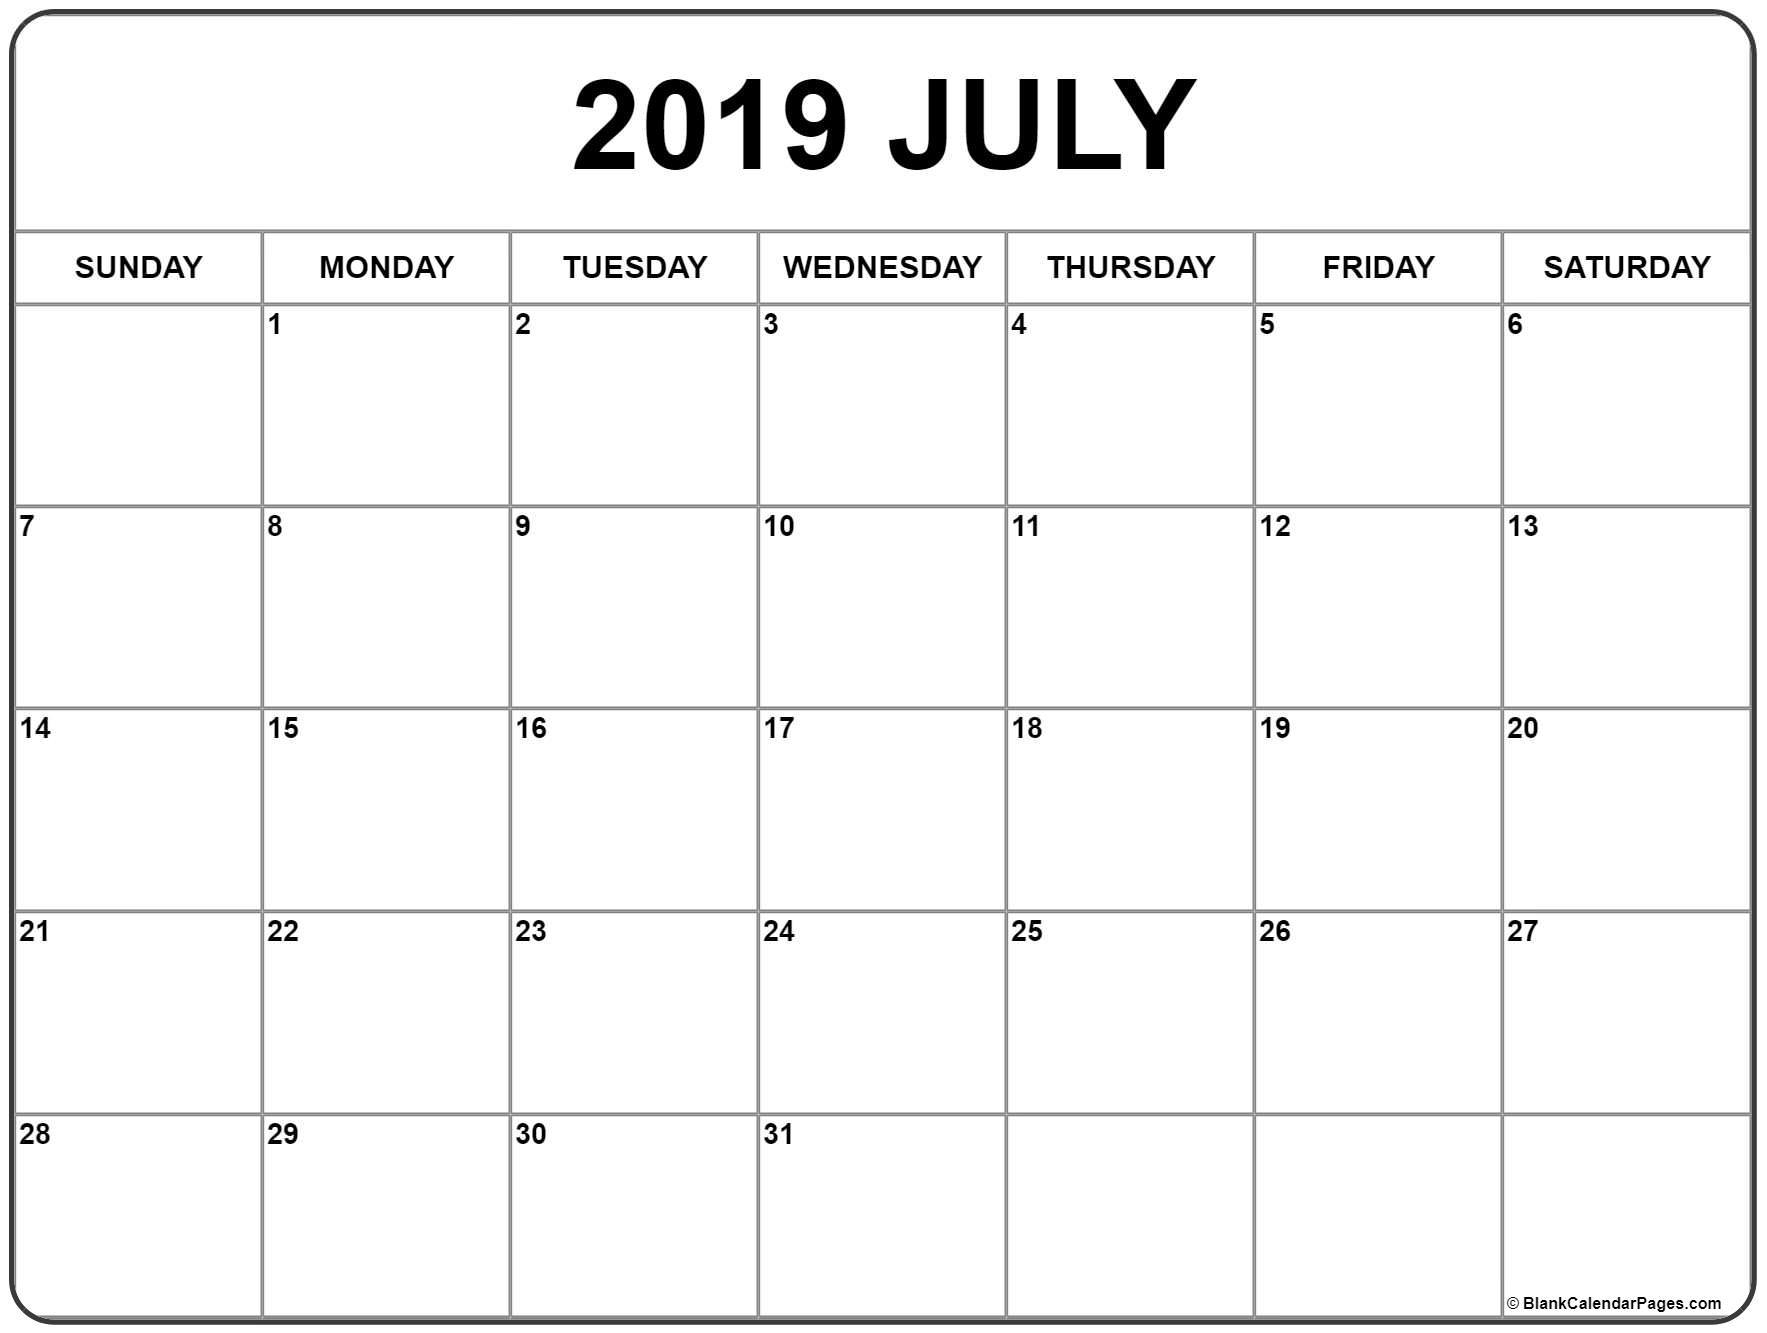 July 2019 Calendar | Free Printable Monthly Calendars with regard to Blanket Calender Printables For December